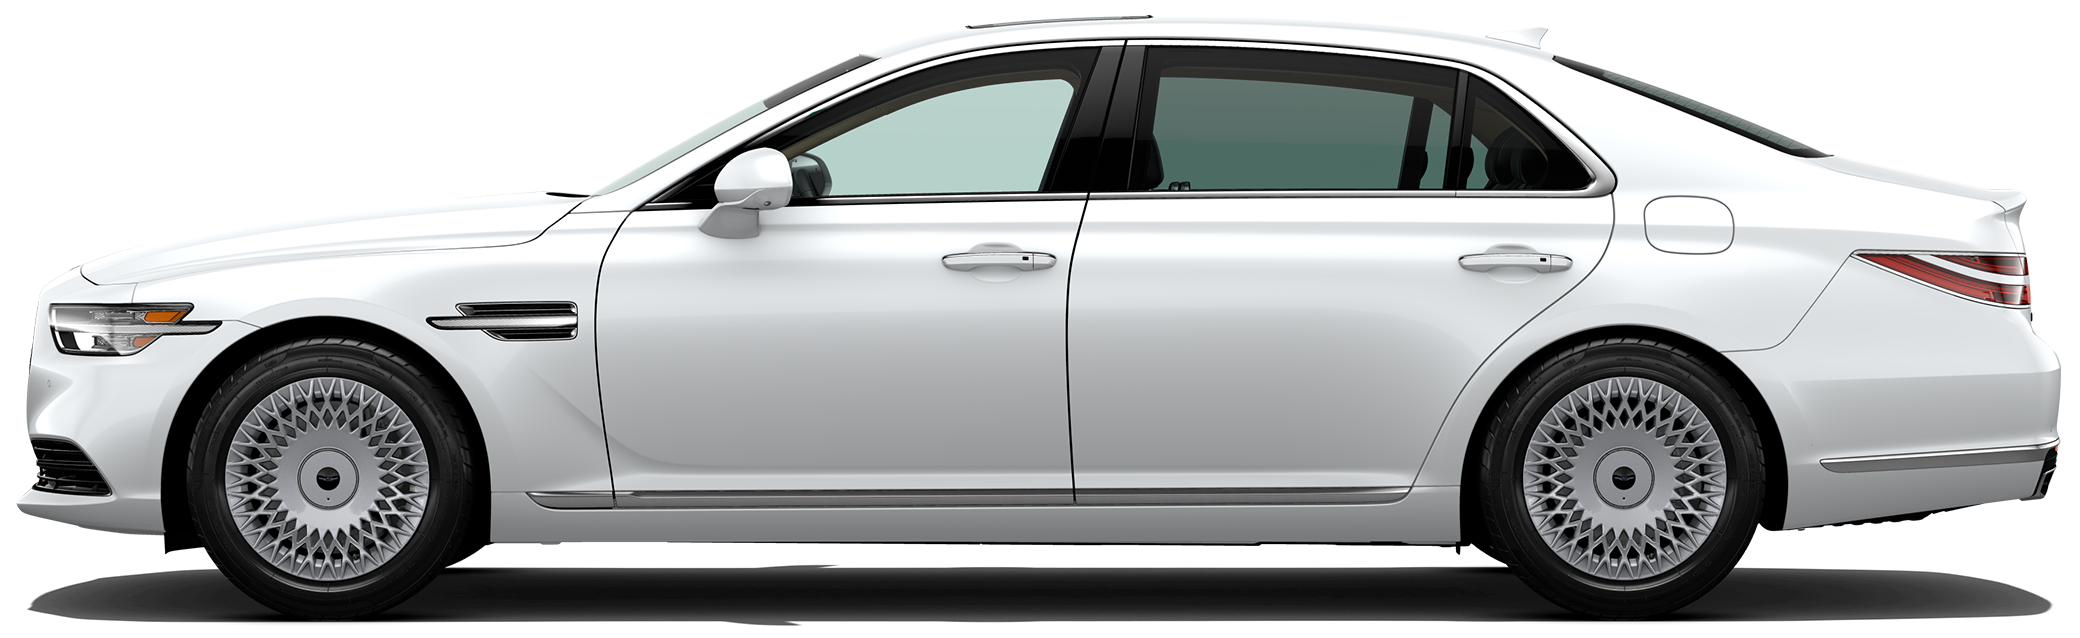 2021 Genesis G90 Sedan 3.3T Premium RWD